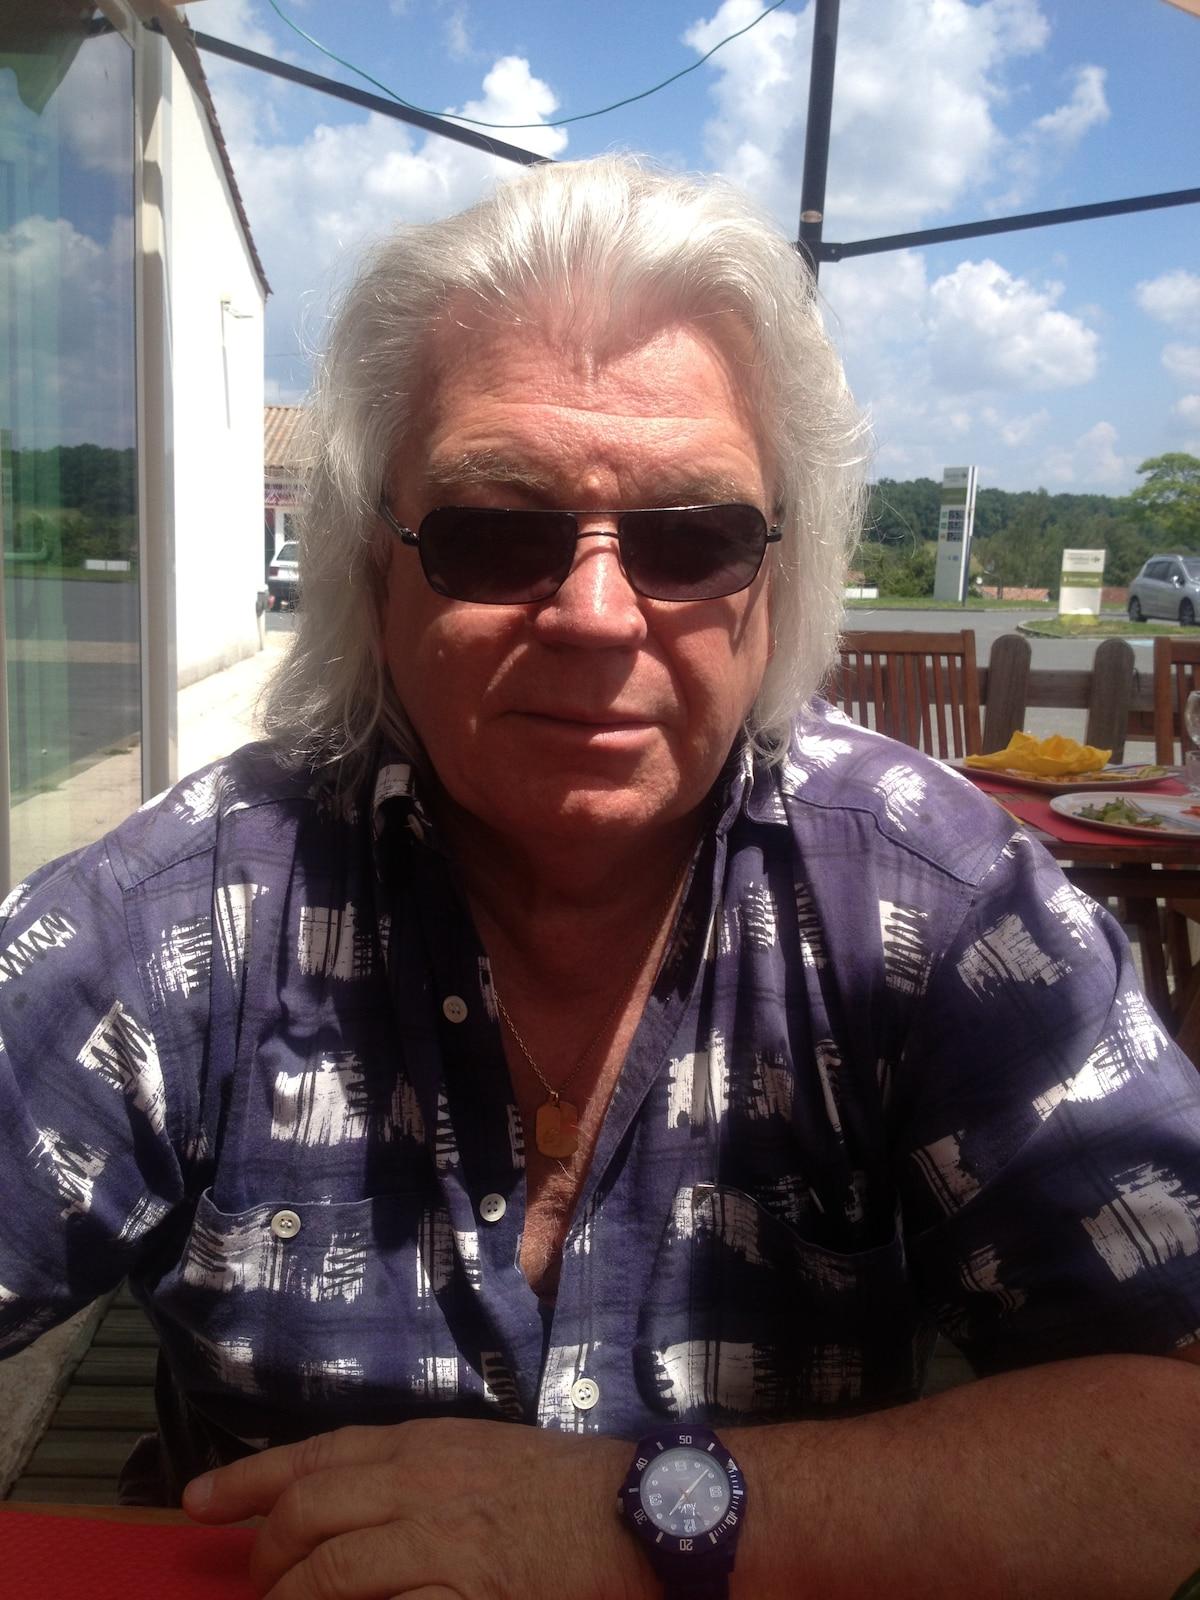 Roger From Lespignan, France